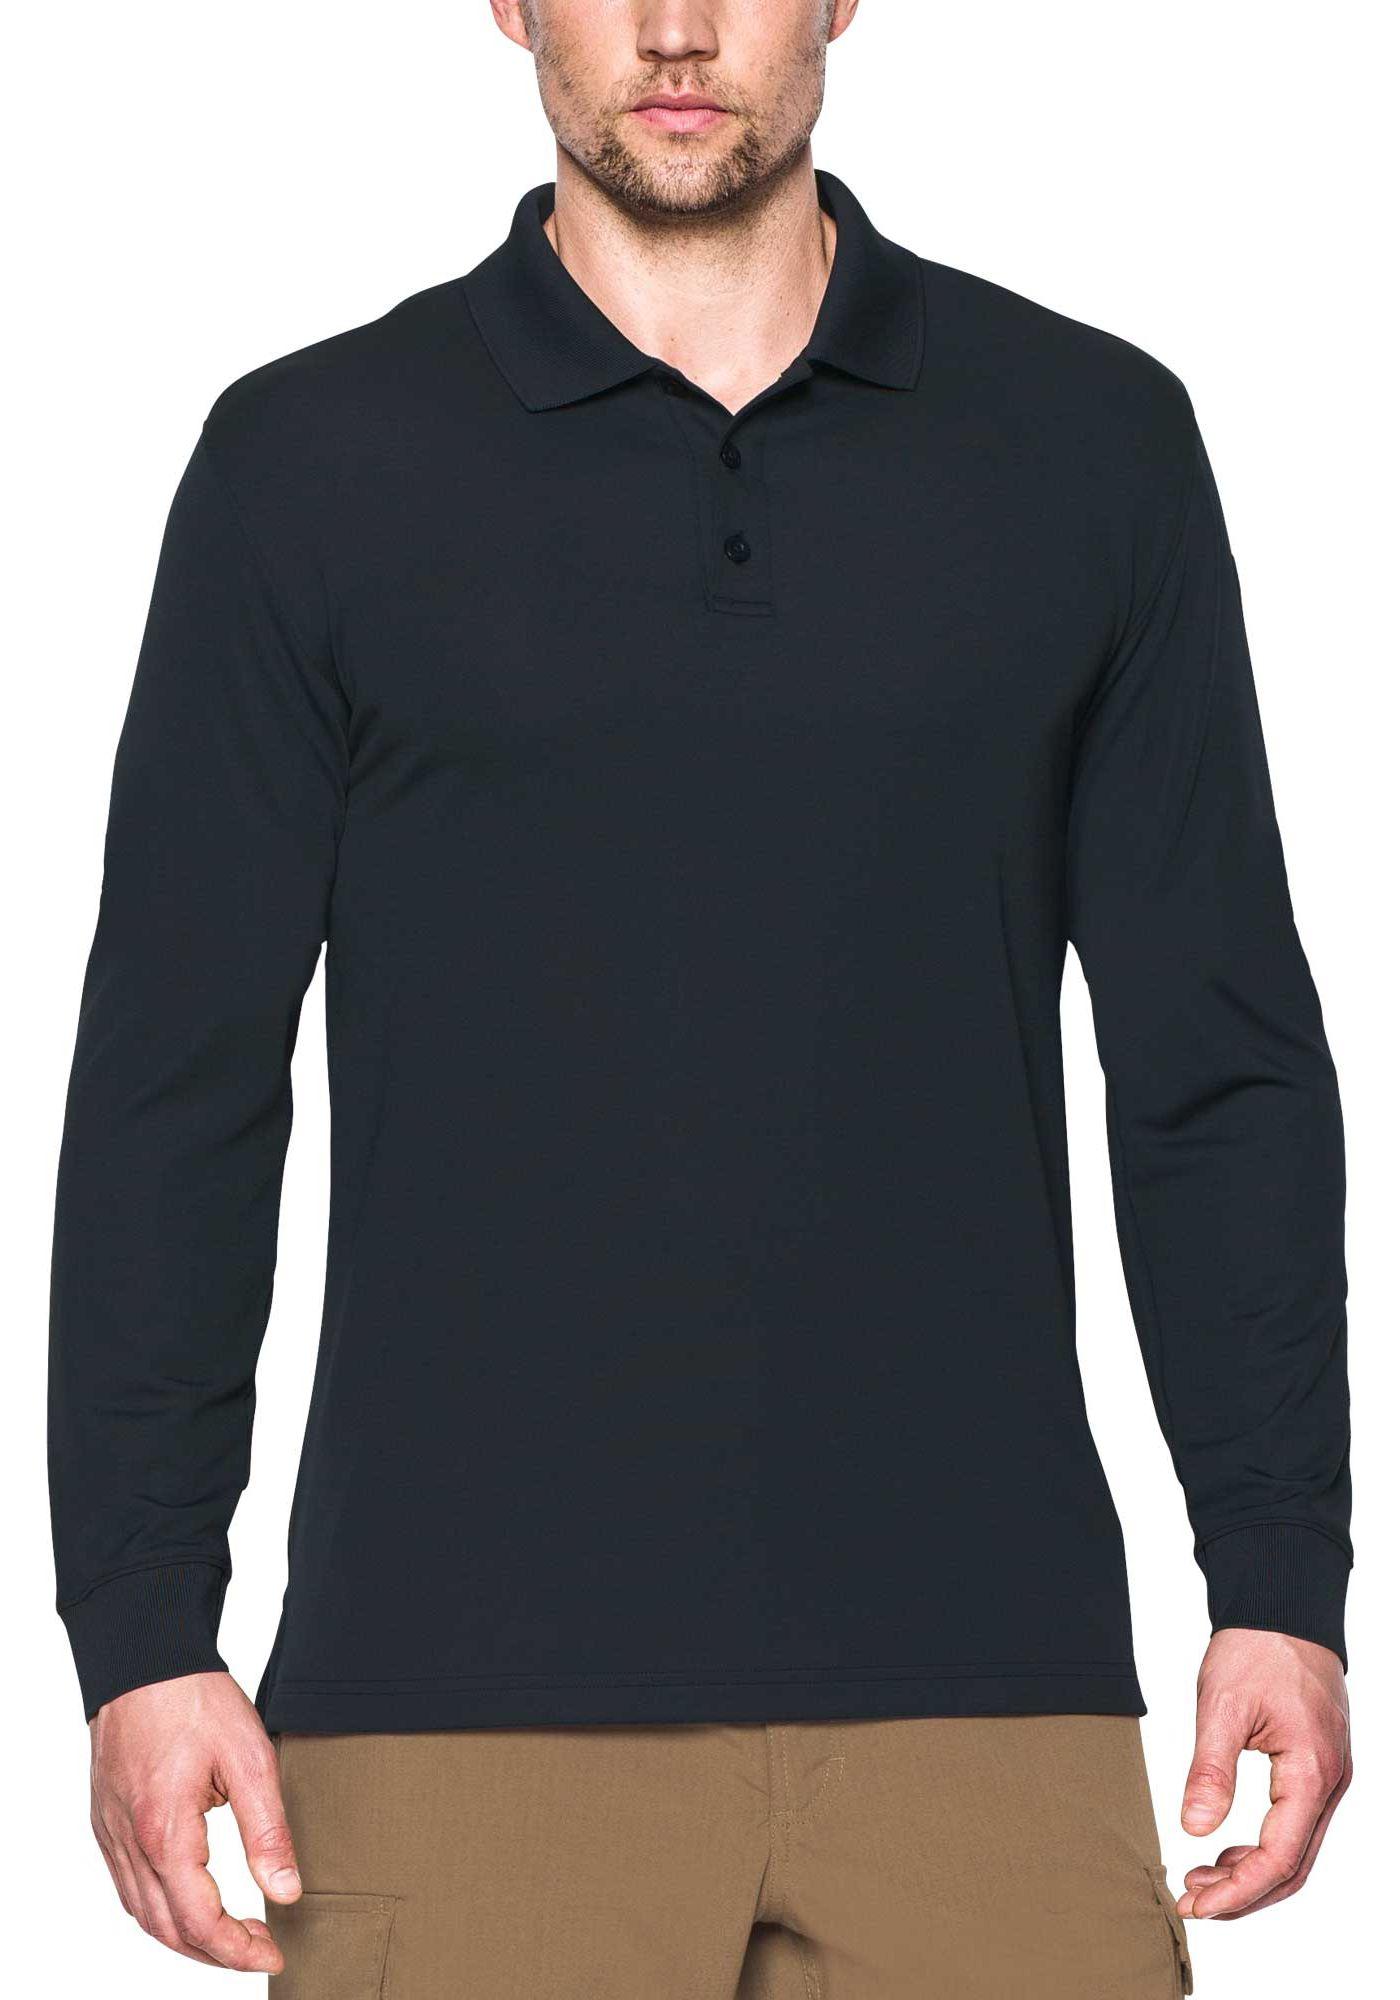 Under Armour Men's Tactical Performance Long Sleeve Shirt